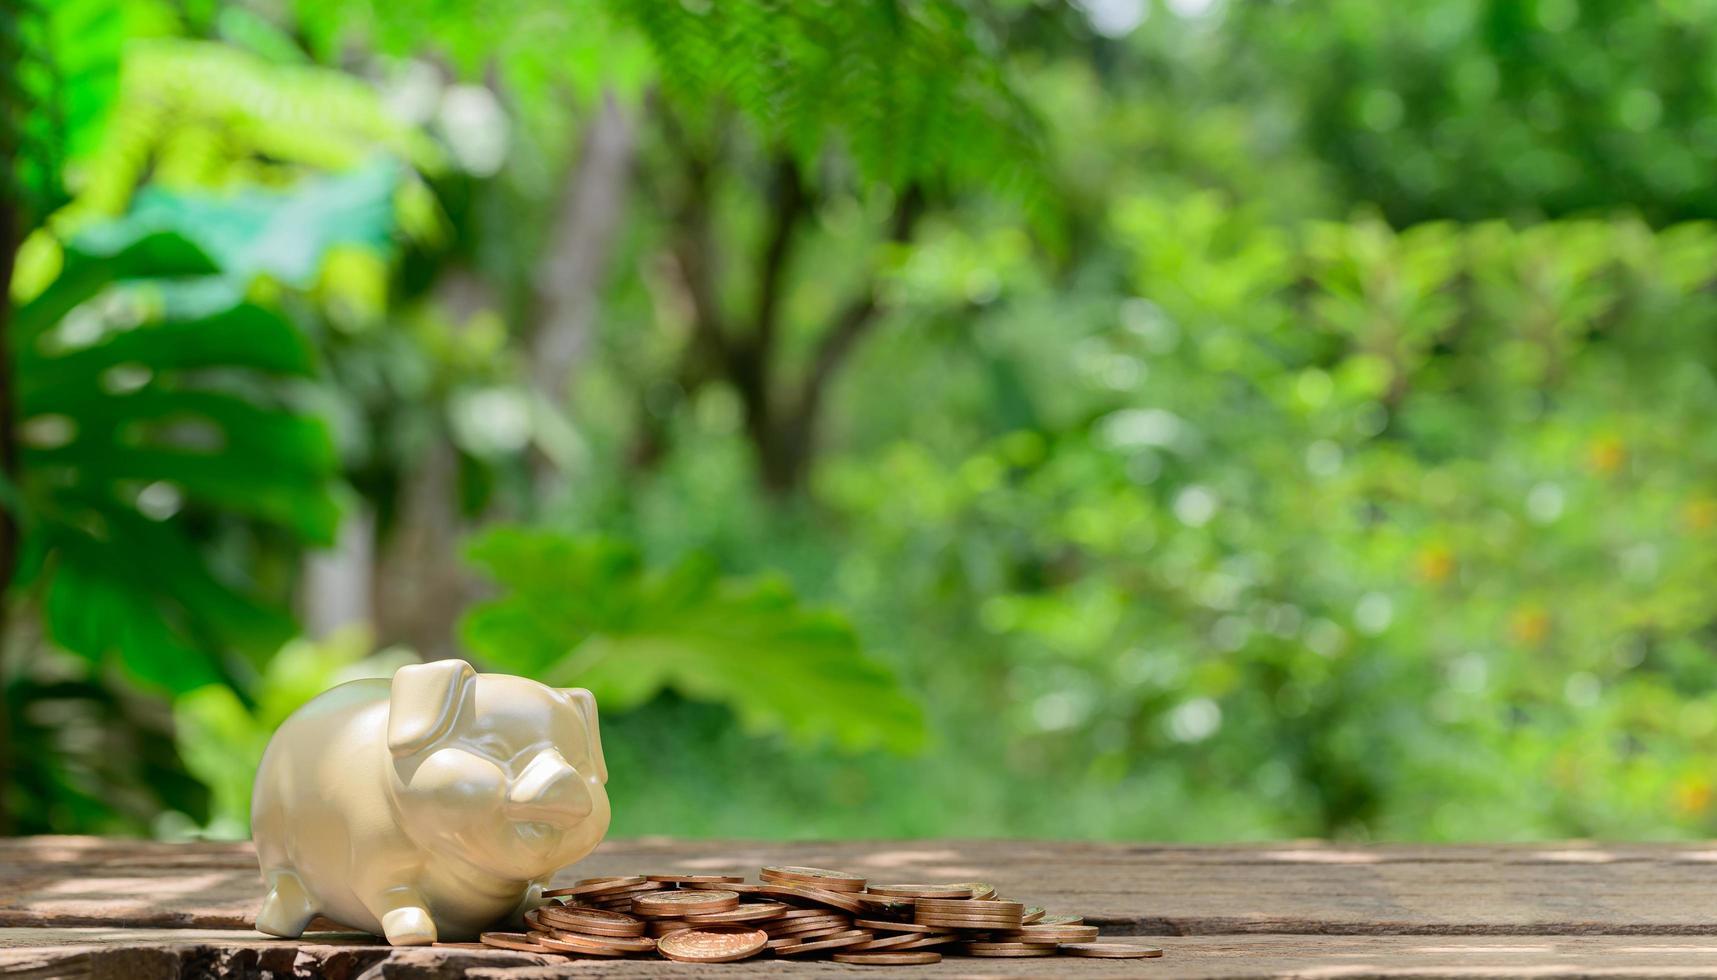 koncept staplade mynt investera lager spara pengar foto